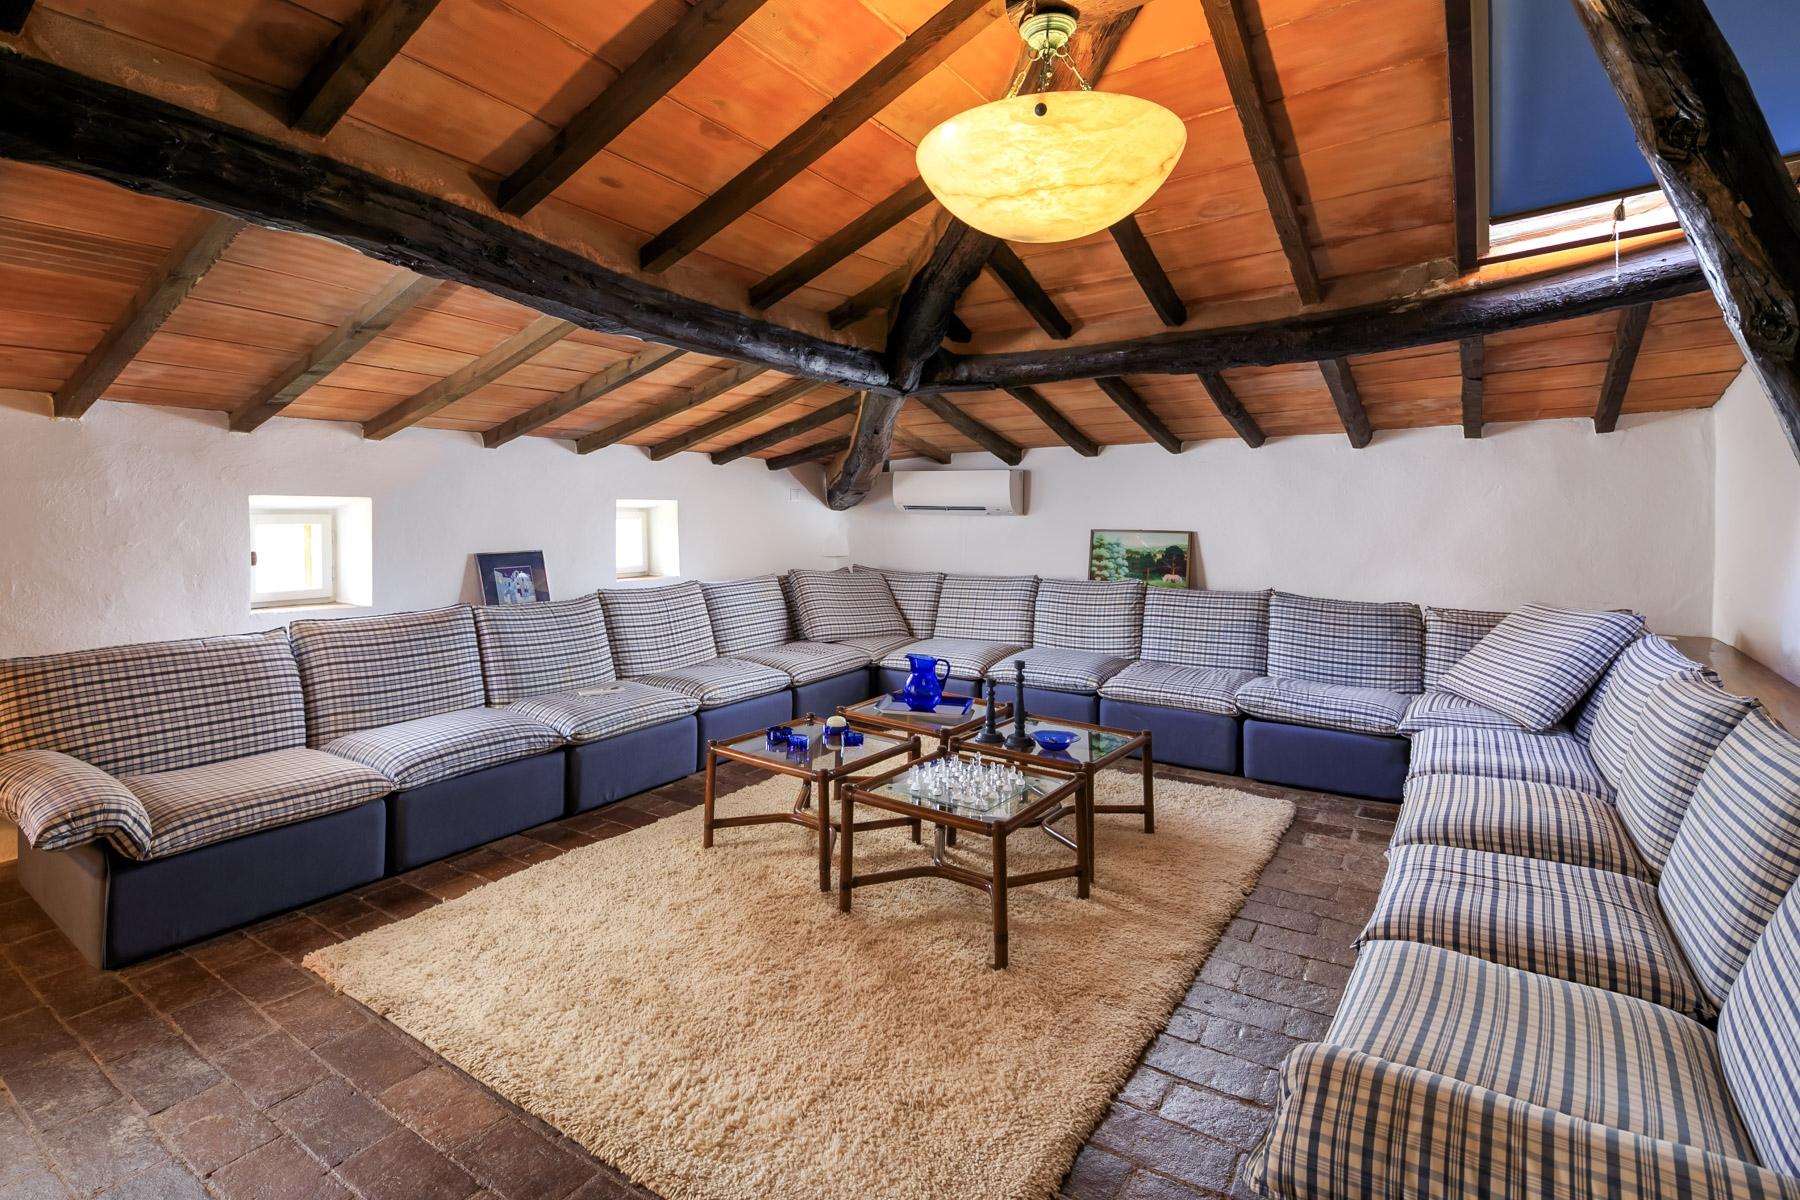 Villa in Vendita a Campiglia Marittima: 5 locali, 1100 mq - Foto 22